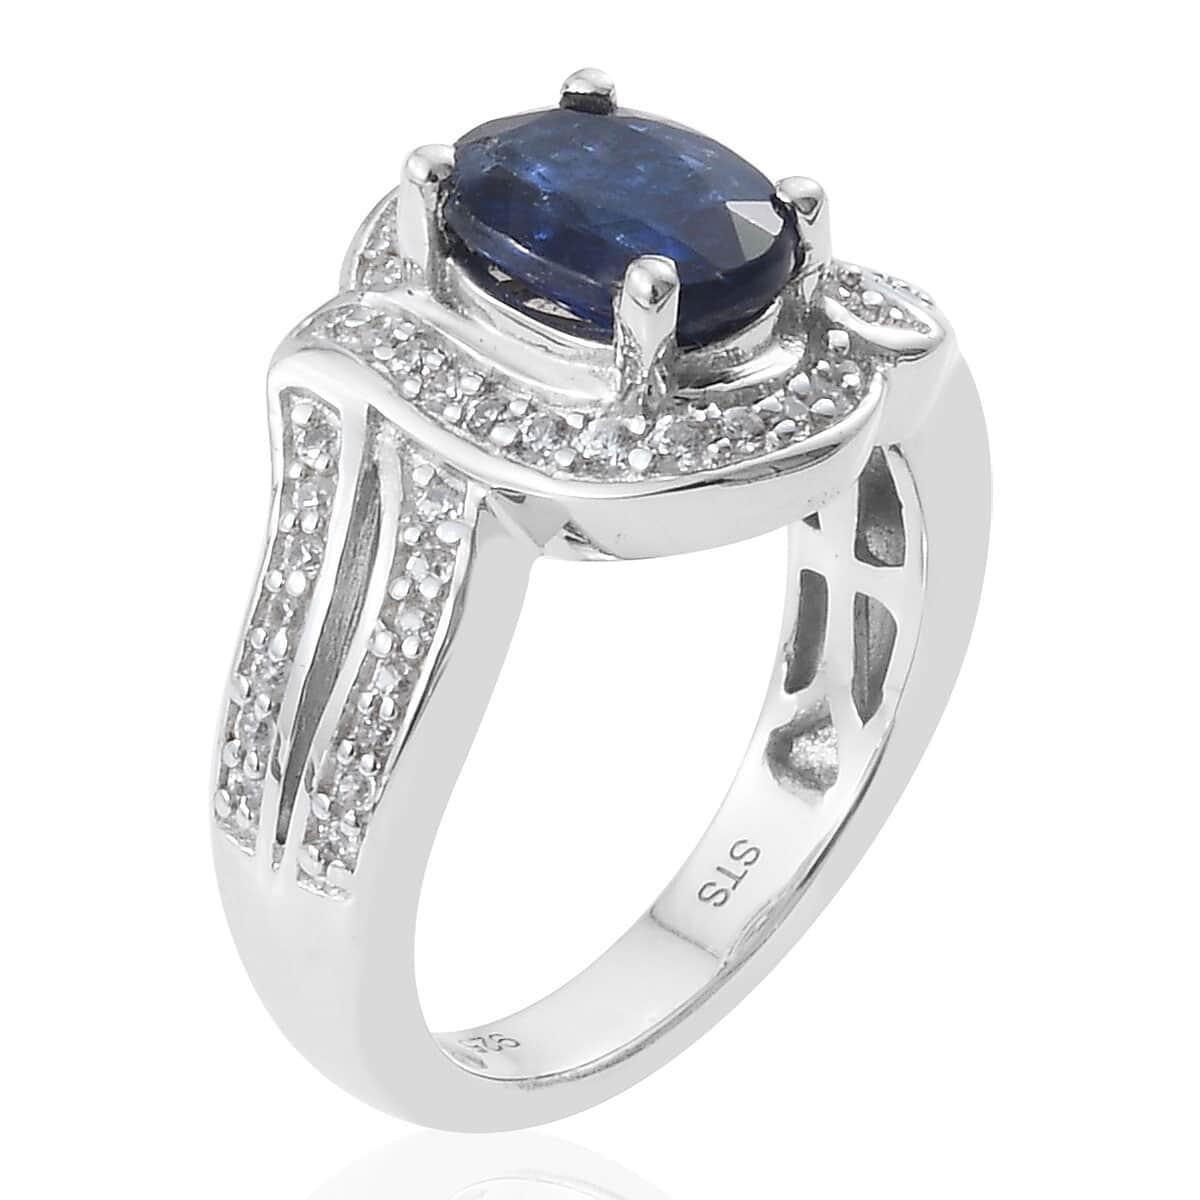 Kashmir Kyanite, Cambodian Zircon Ring in Platinum Over Sterling Silver (Size 10.0) 1.97 ctw